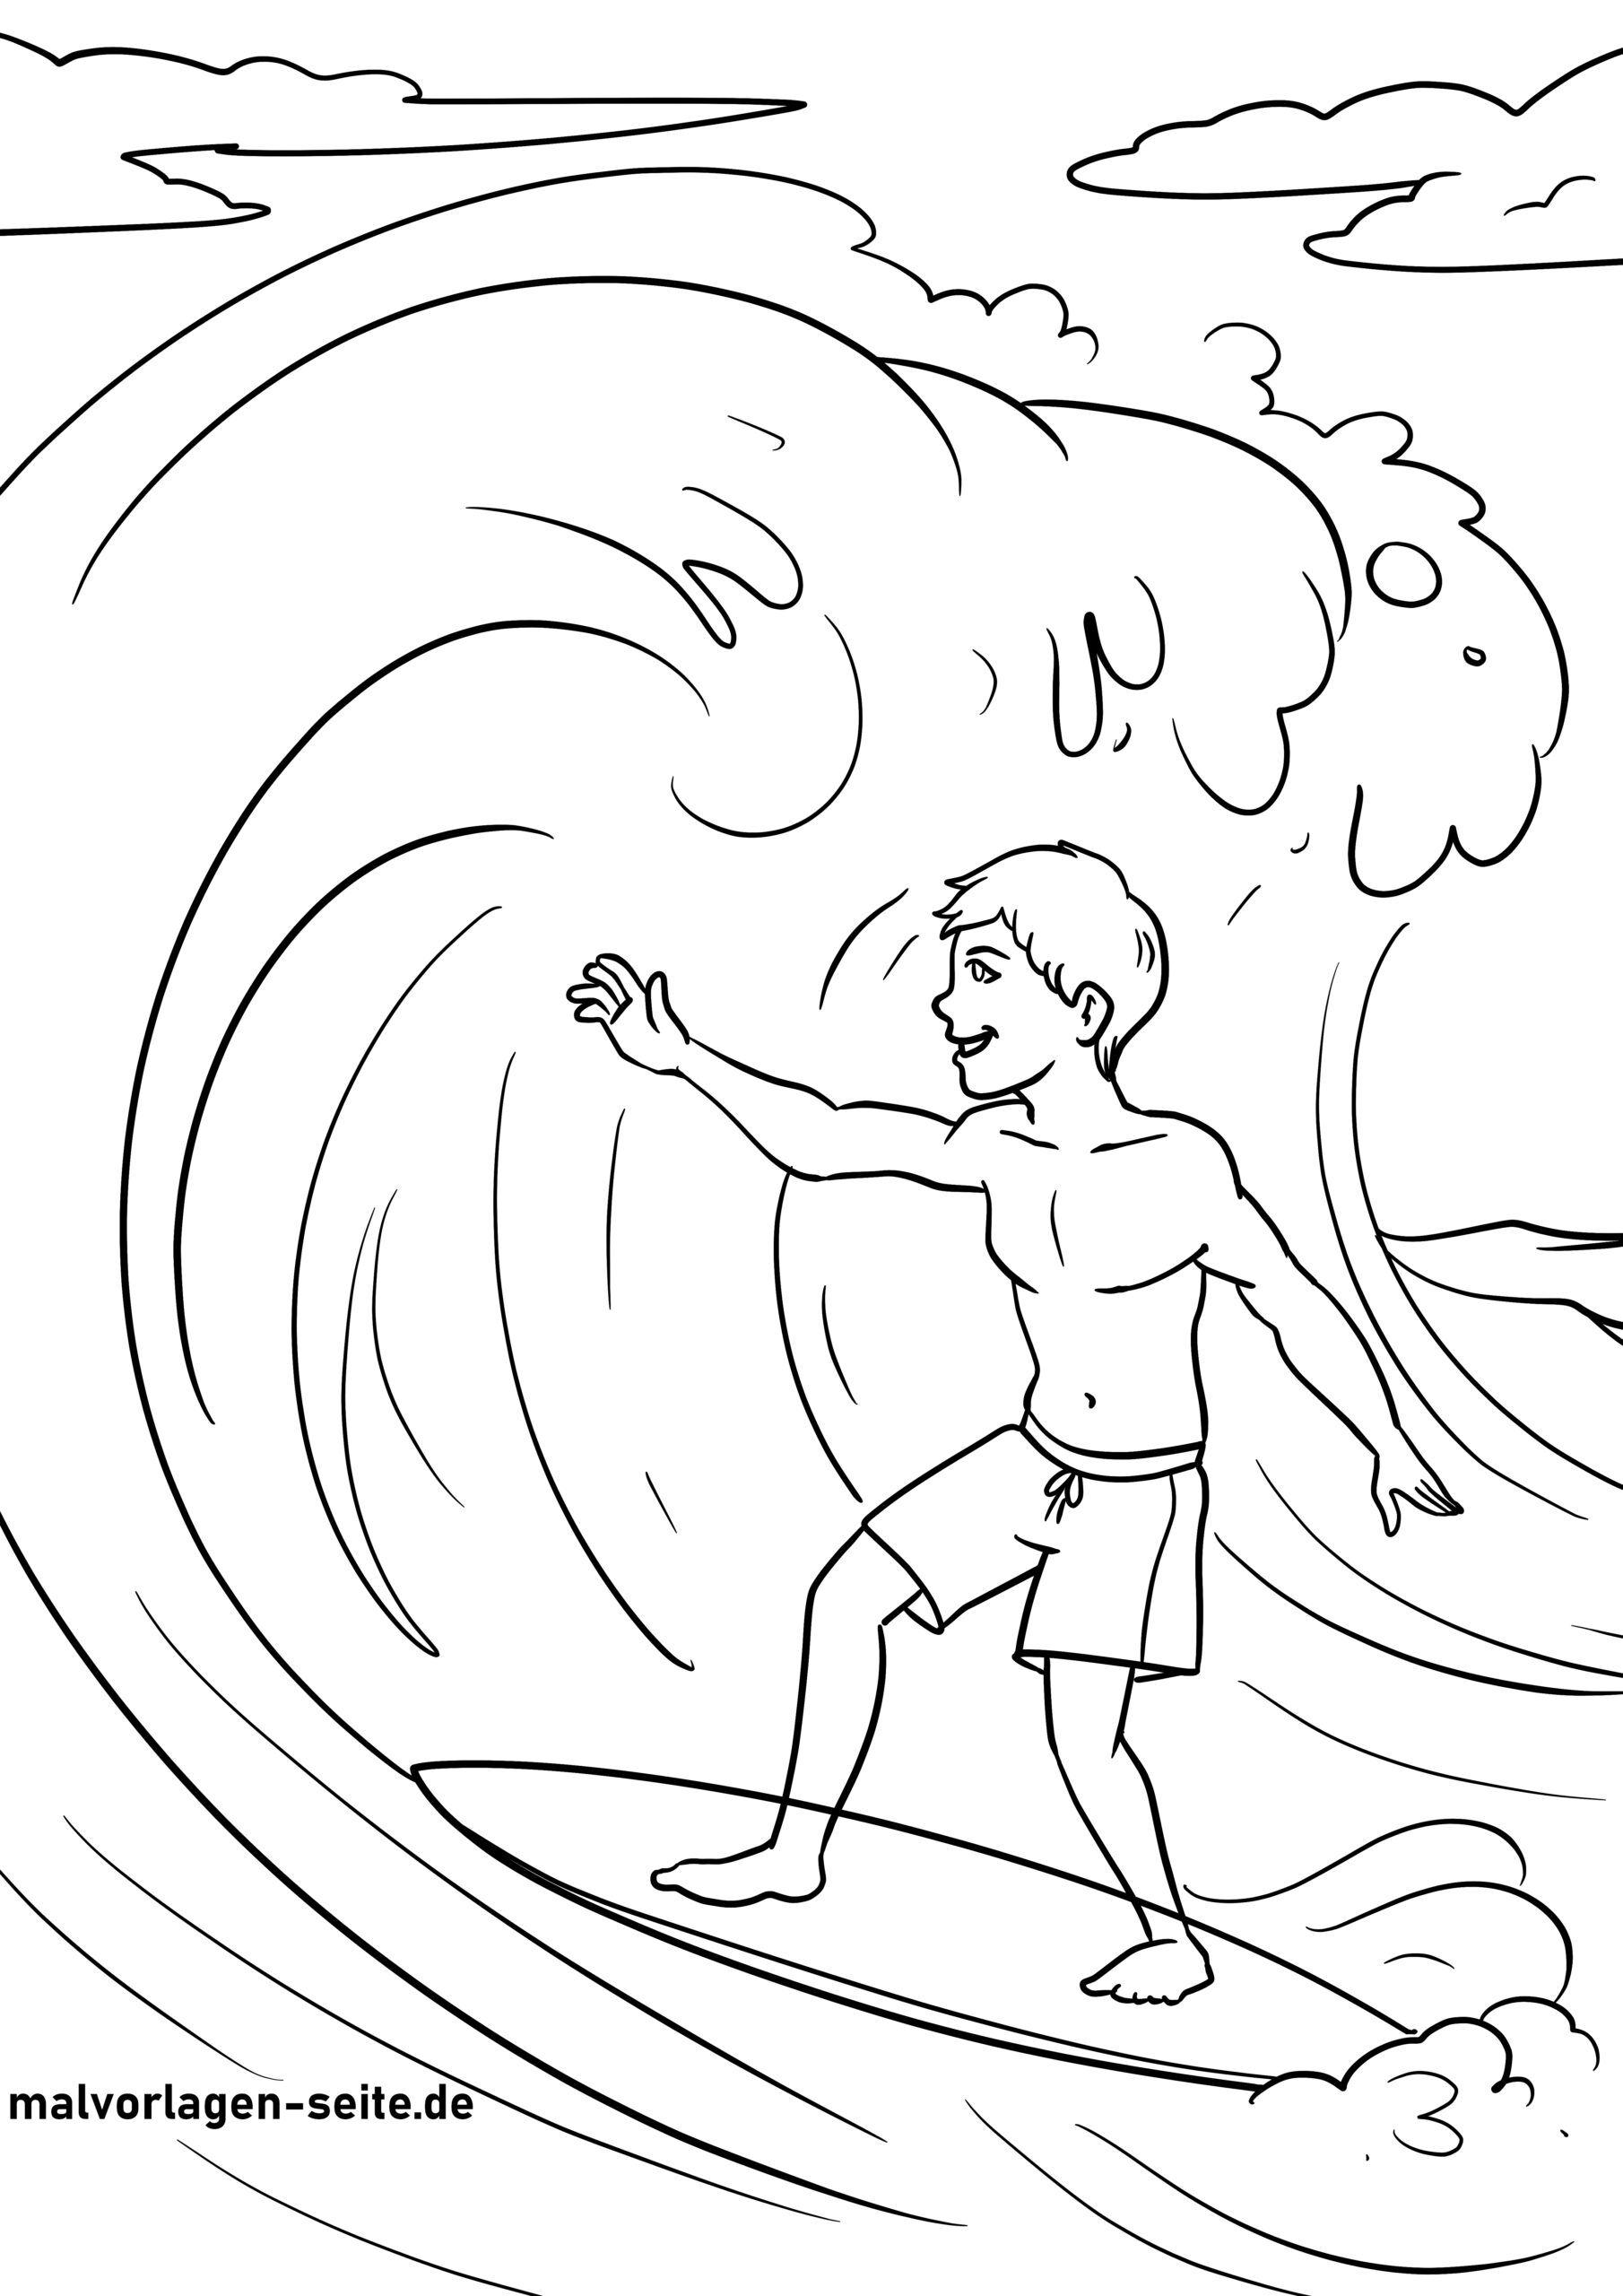 Surfing faciens fuco colorem page